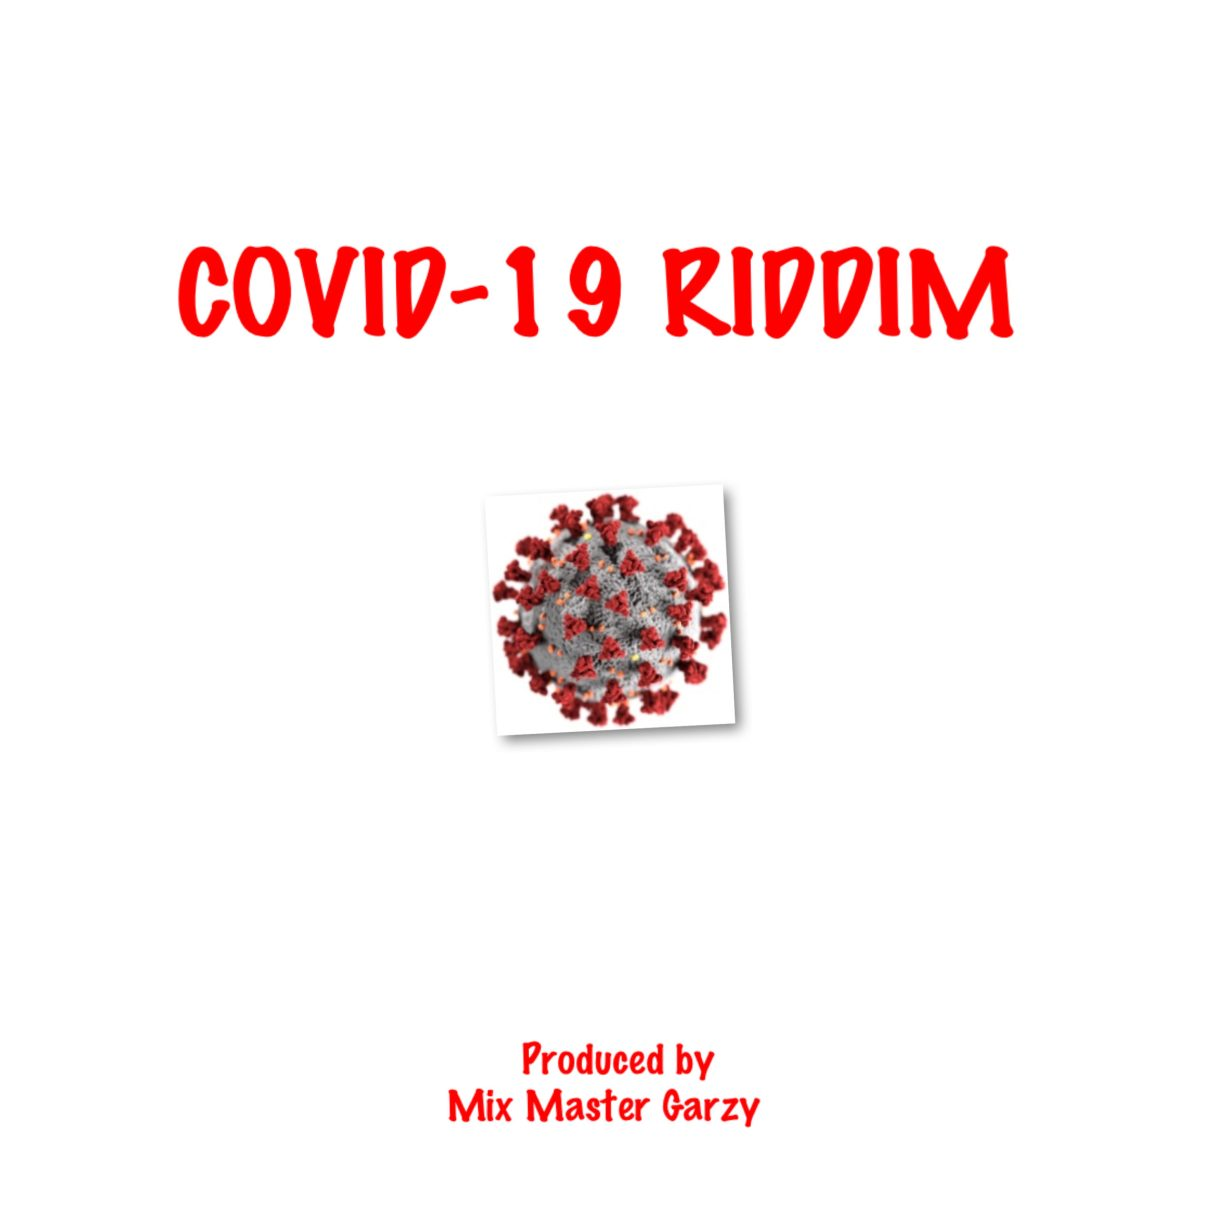 COVID-19 Riddim - (Prod By Mix Master Garzy)